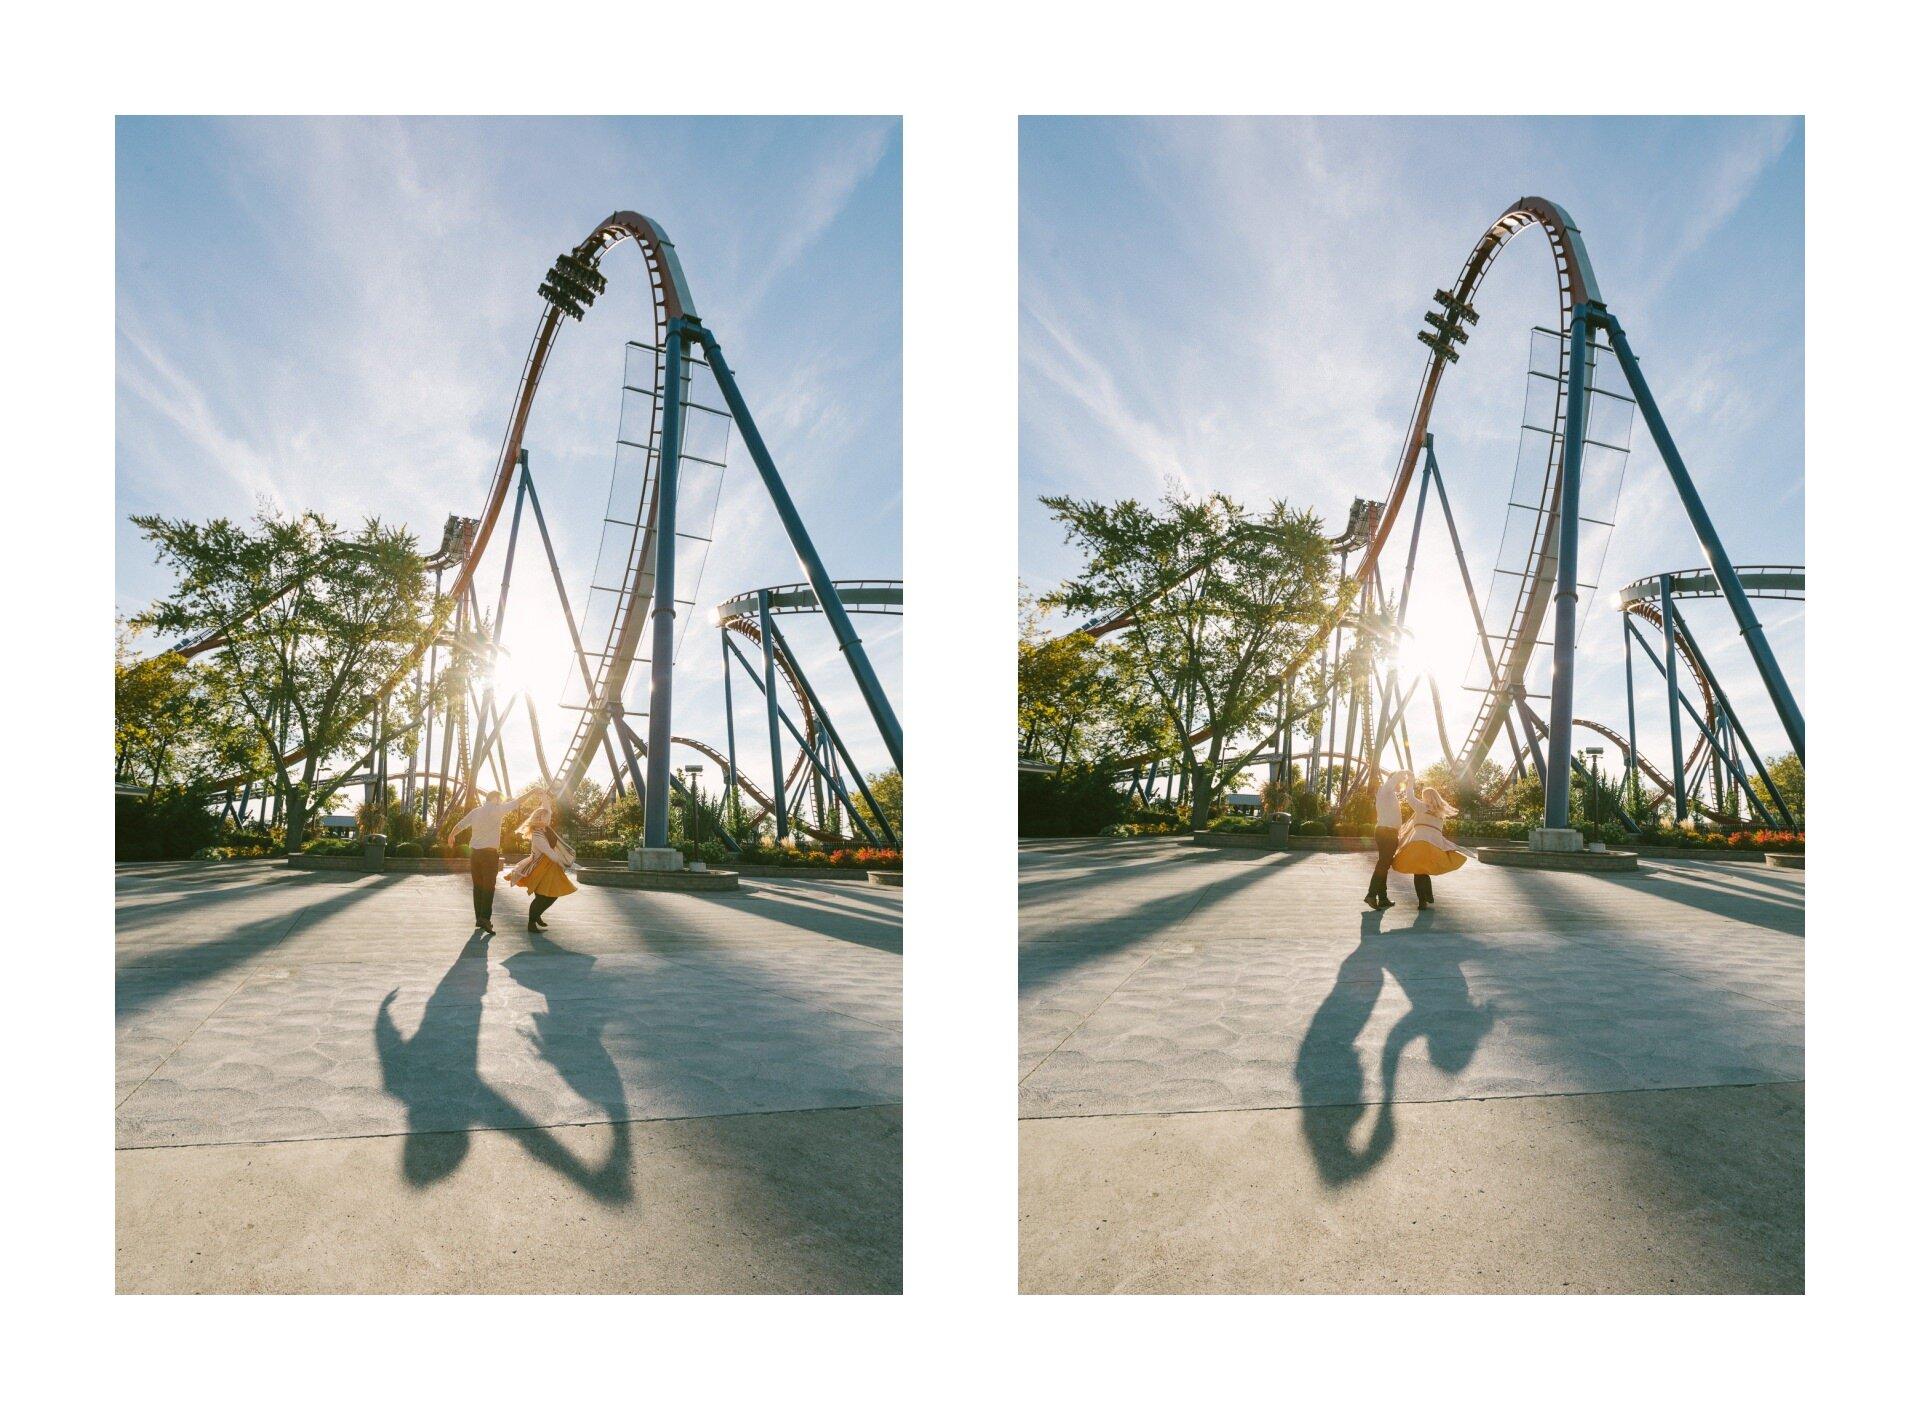 Halloweekends Cedar Point Engagement Photos in Sandusky 4.jpg